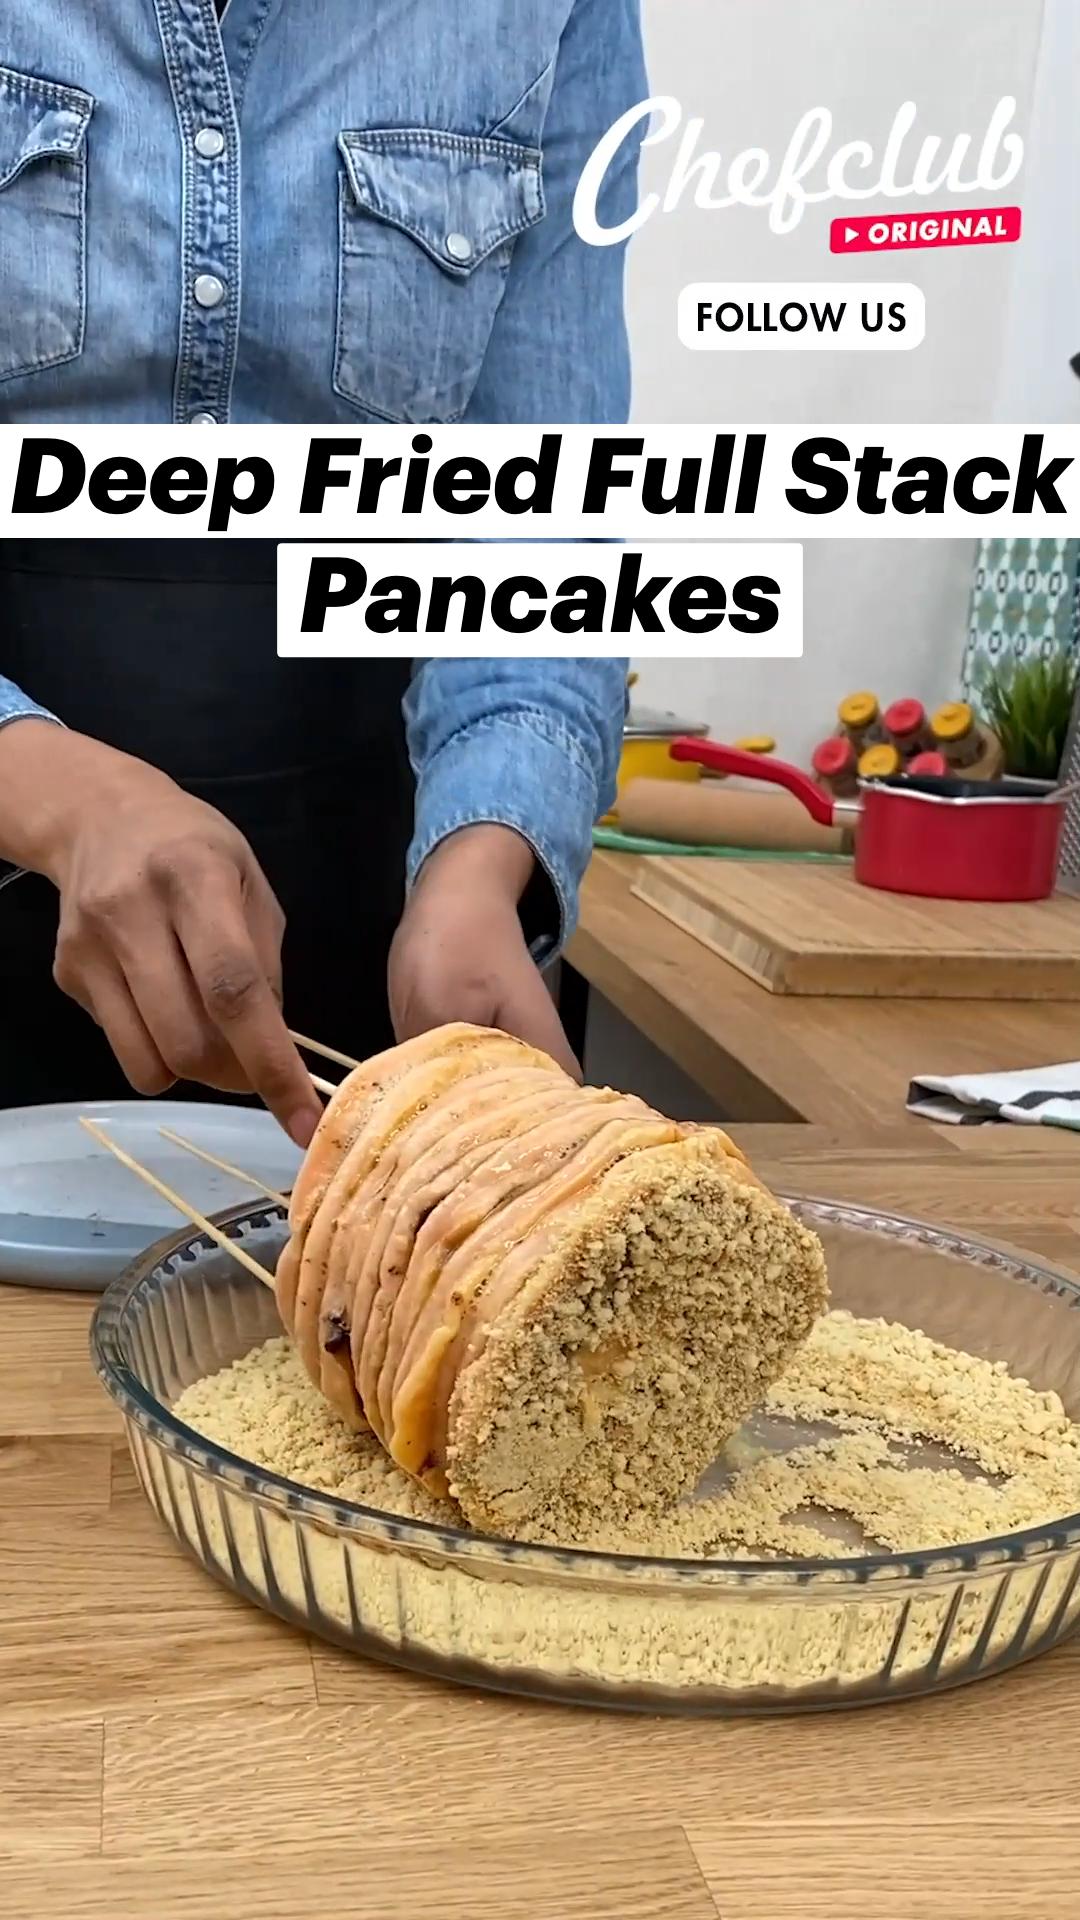 Deep Fried Full Stack Pancakes